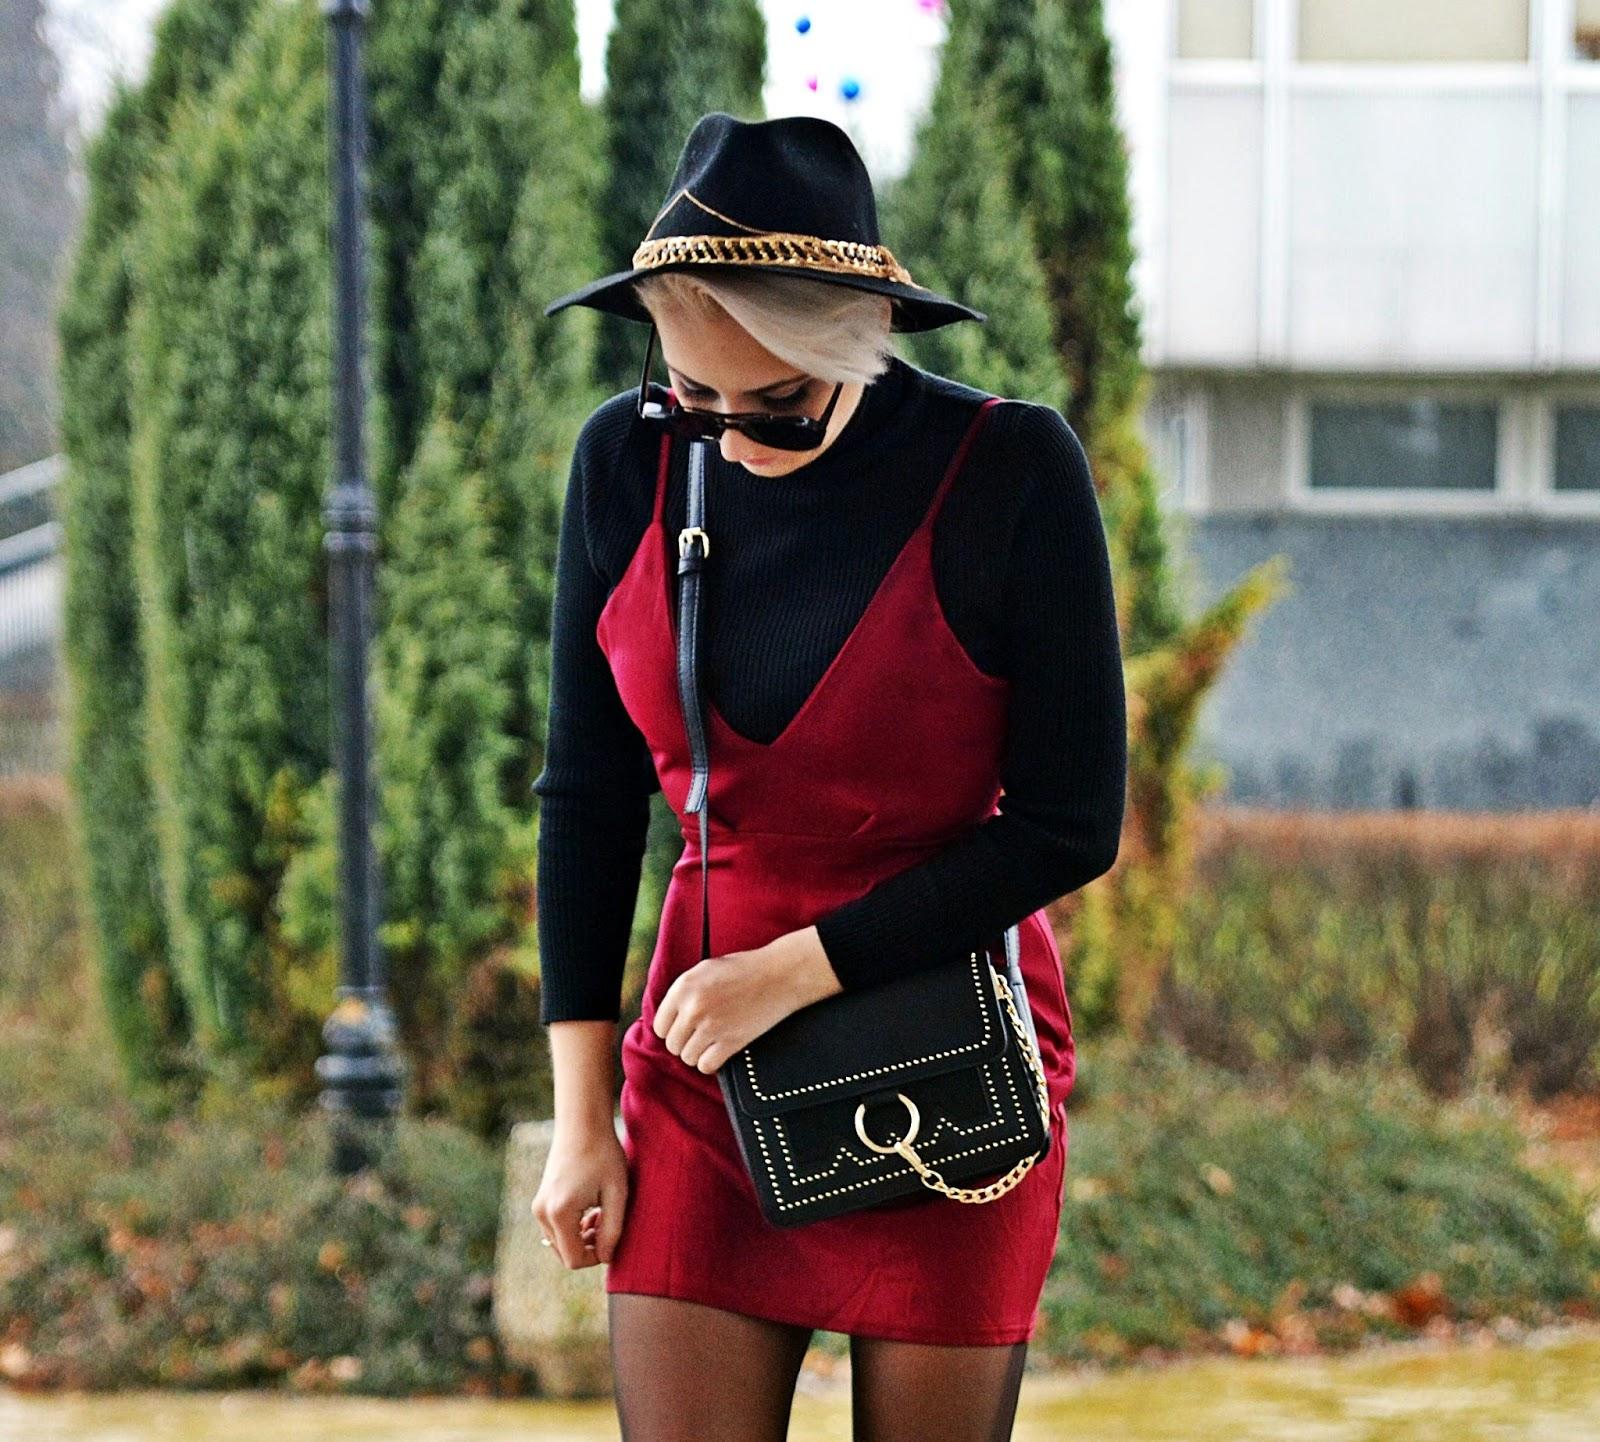 bordowa_sukienka_czarny_golf_torebka_ring_karyn_2